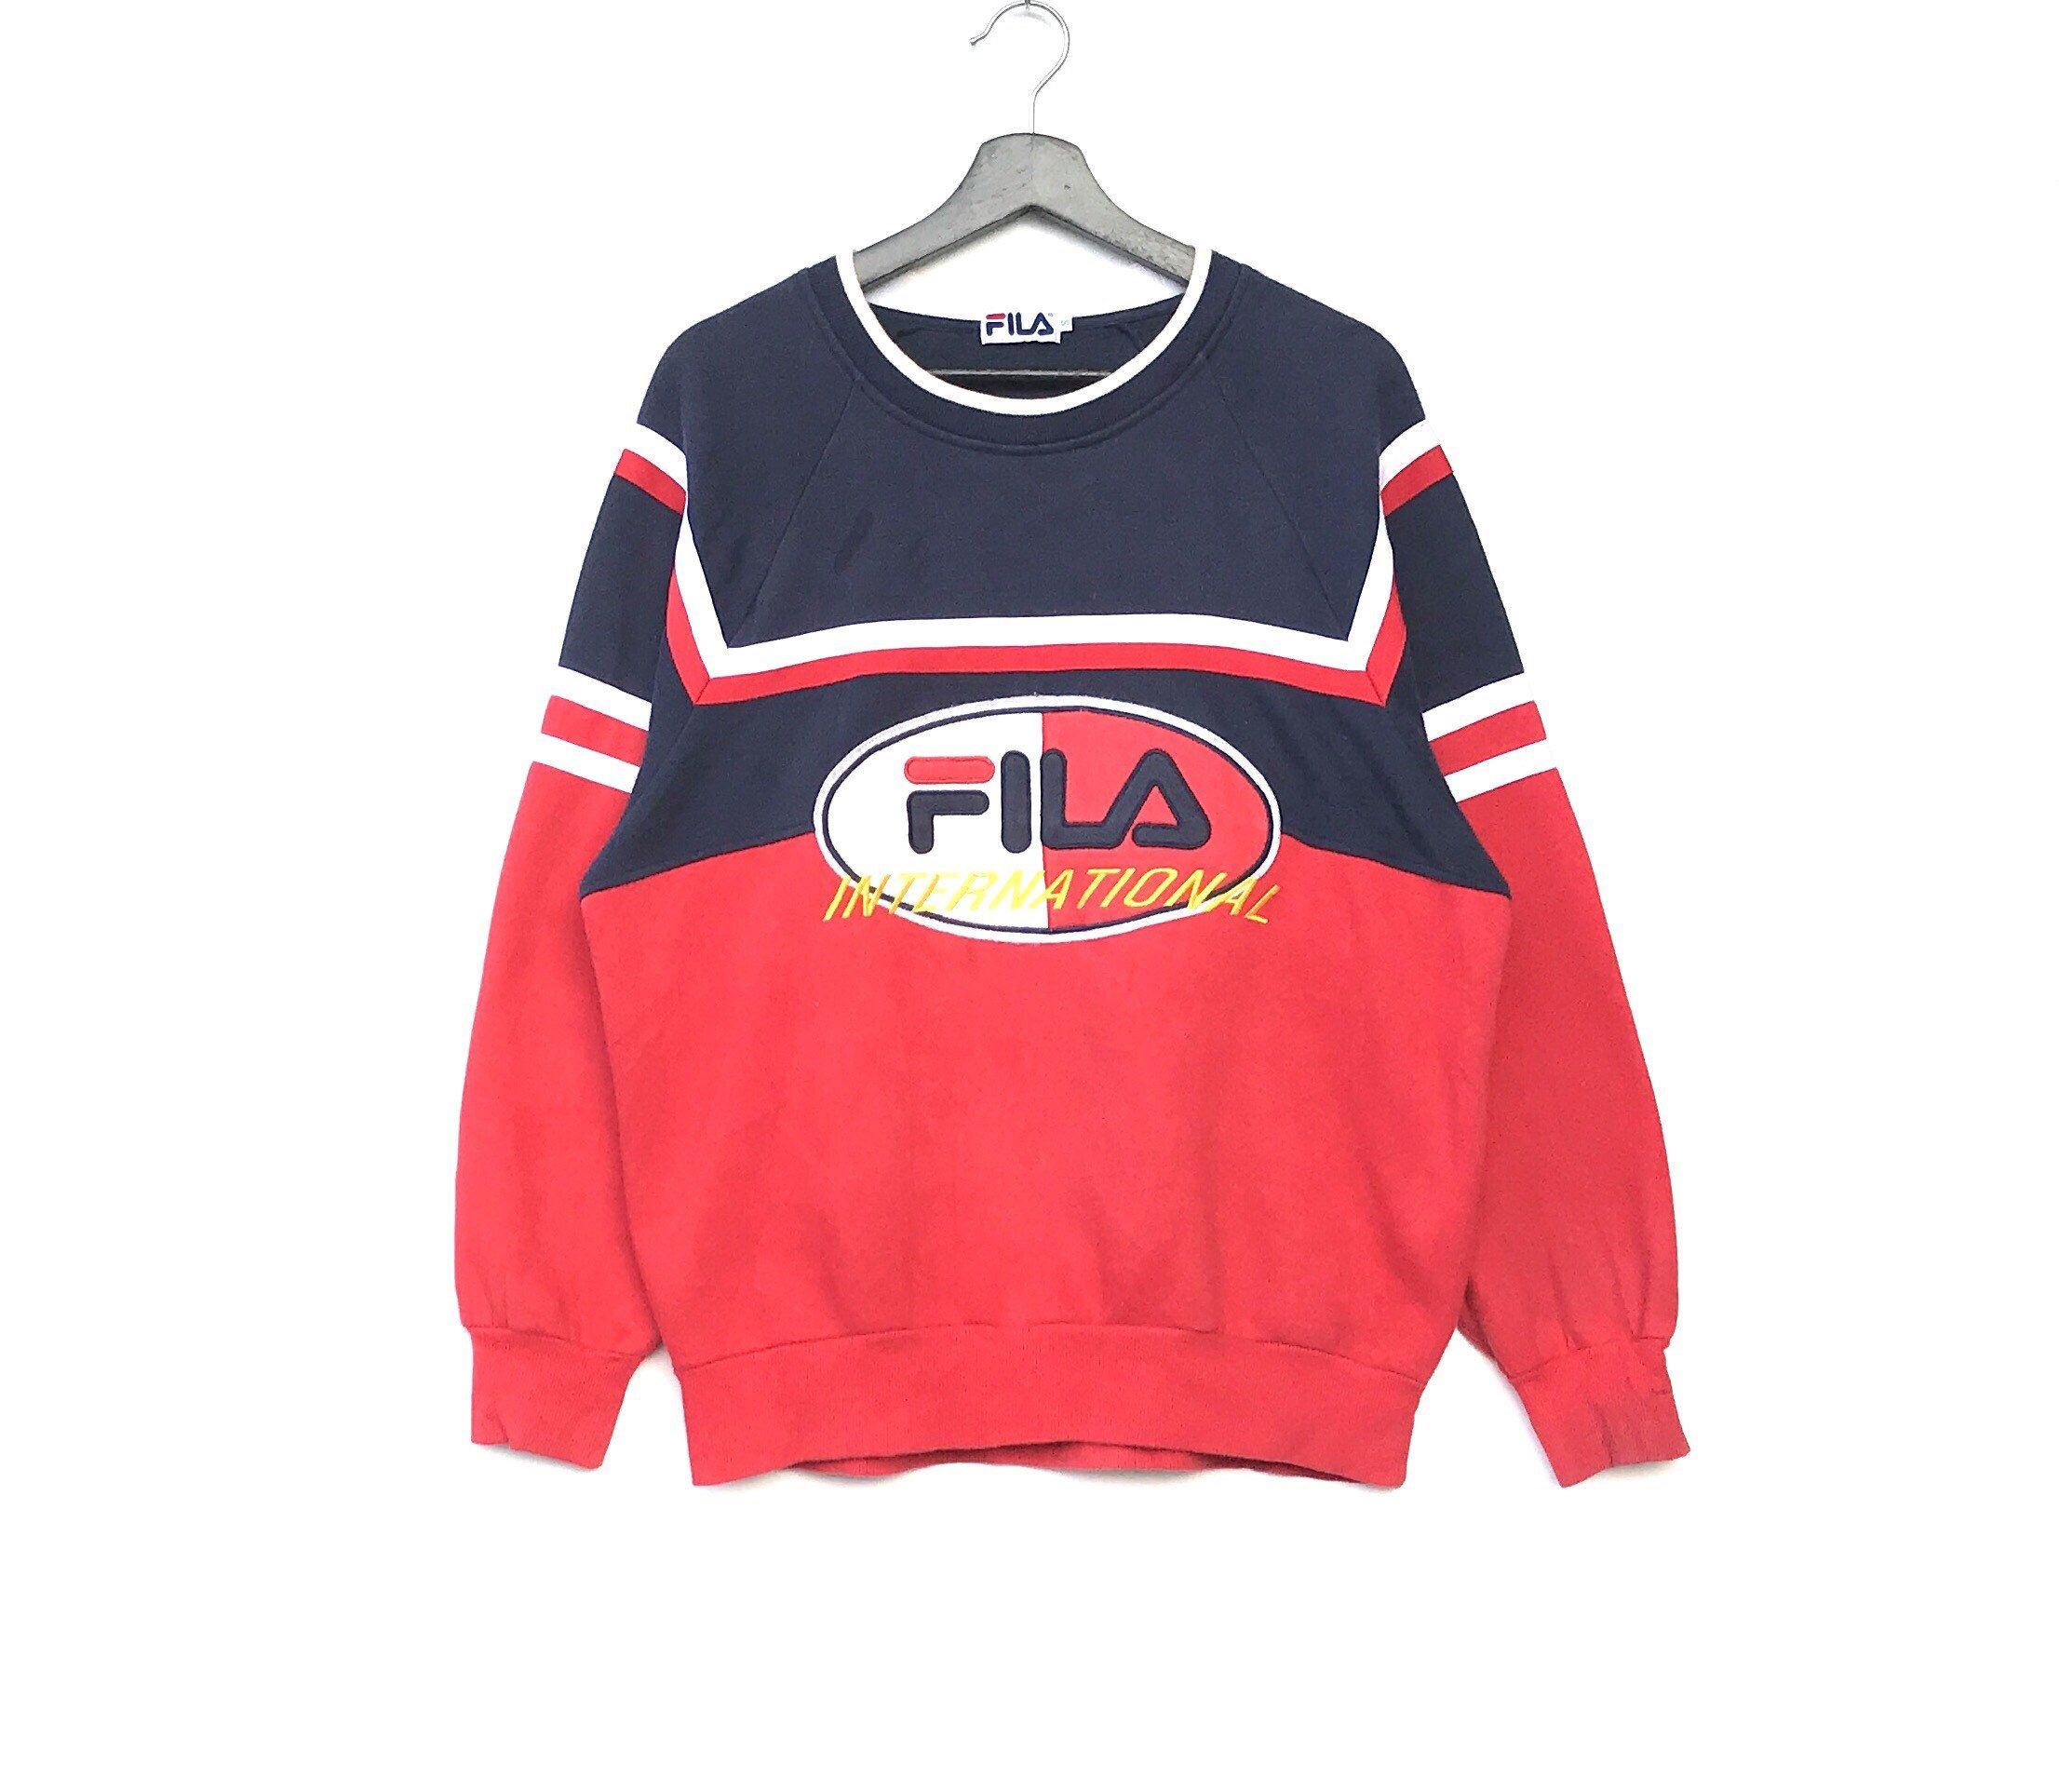 4344889590d2 FILA INTERNATIONAL Big Logo Embroidery Men Clothing Sweatshirt Pullover  Jumper Fila stripes Multicolour Italia Fits medium size  clothing  hoodie   red ...